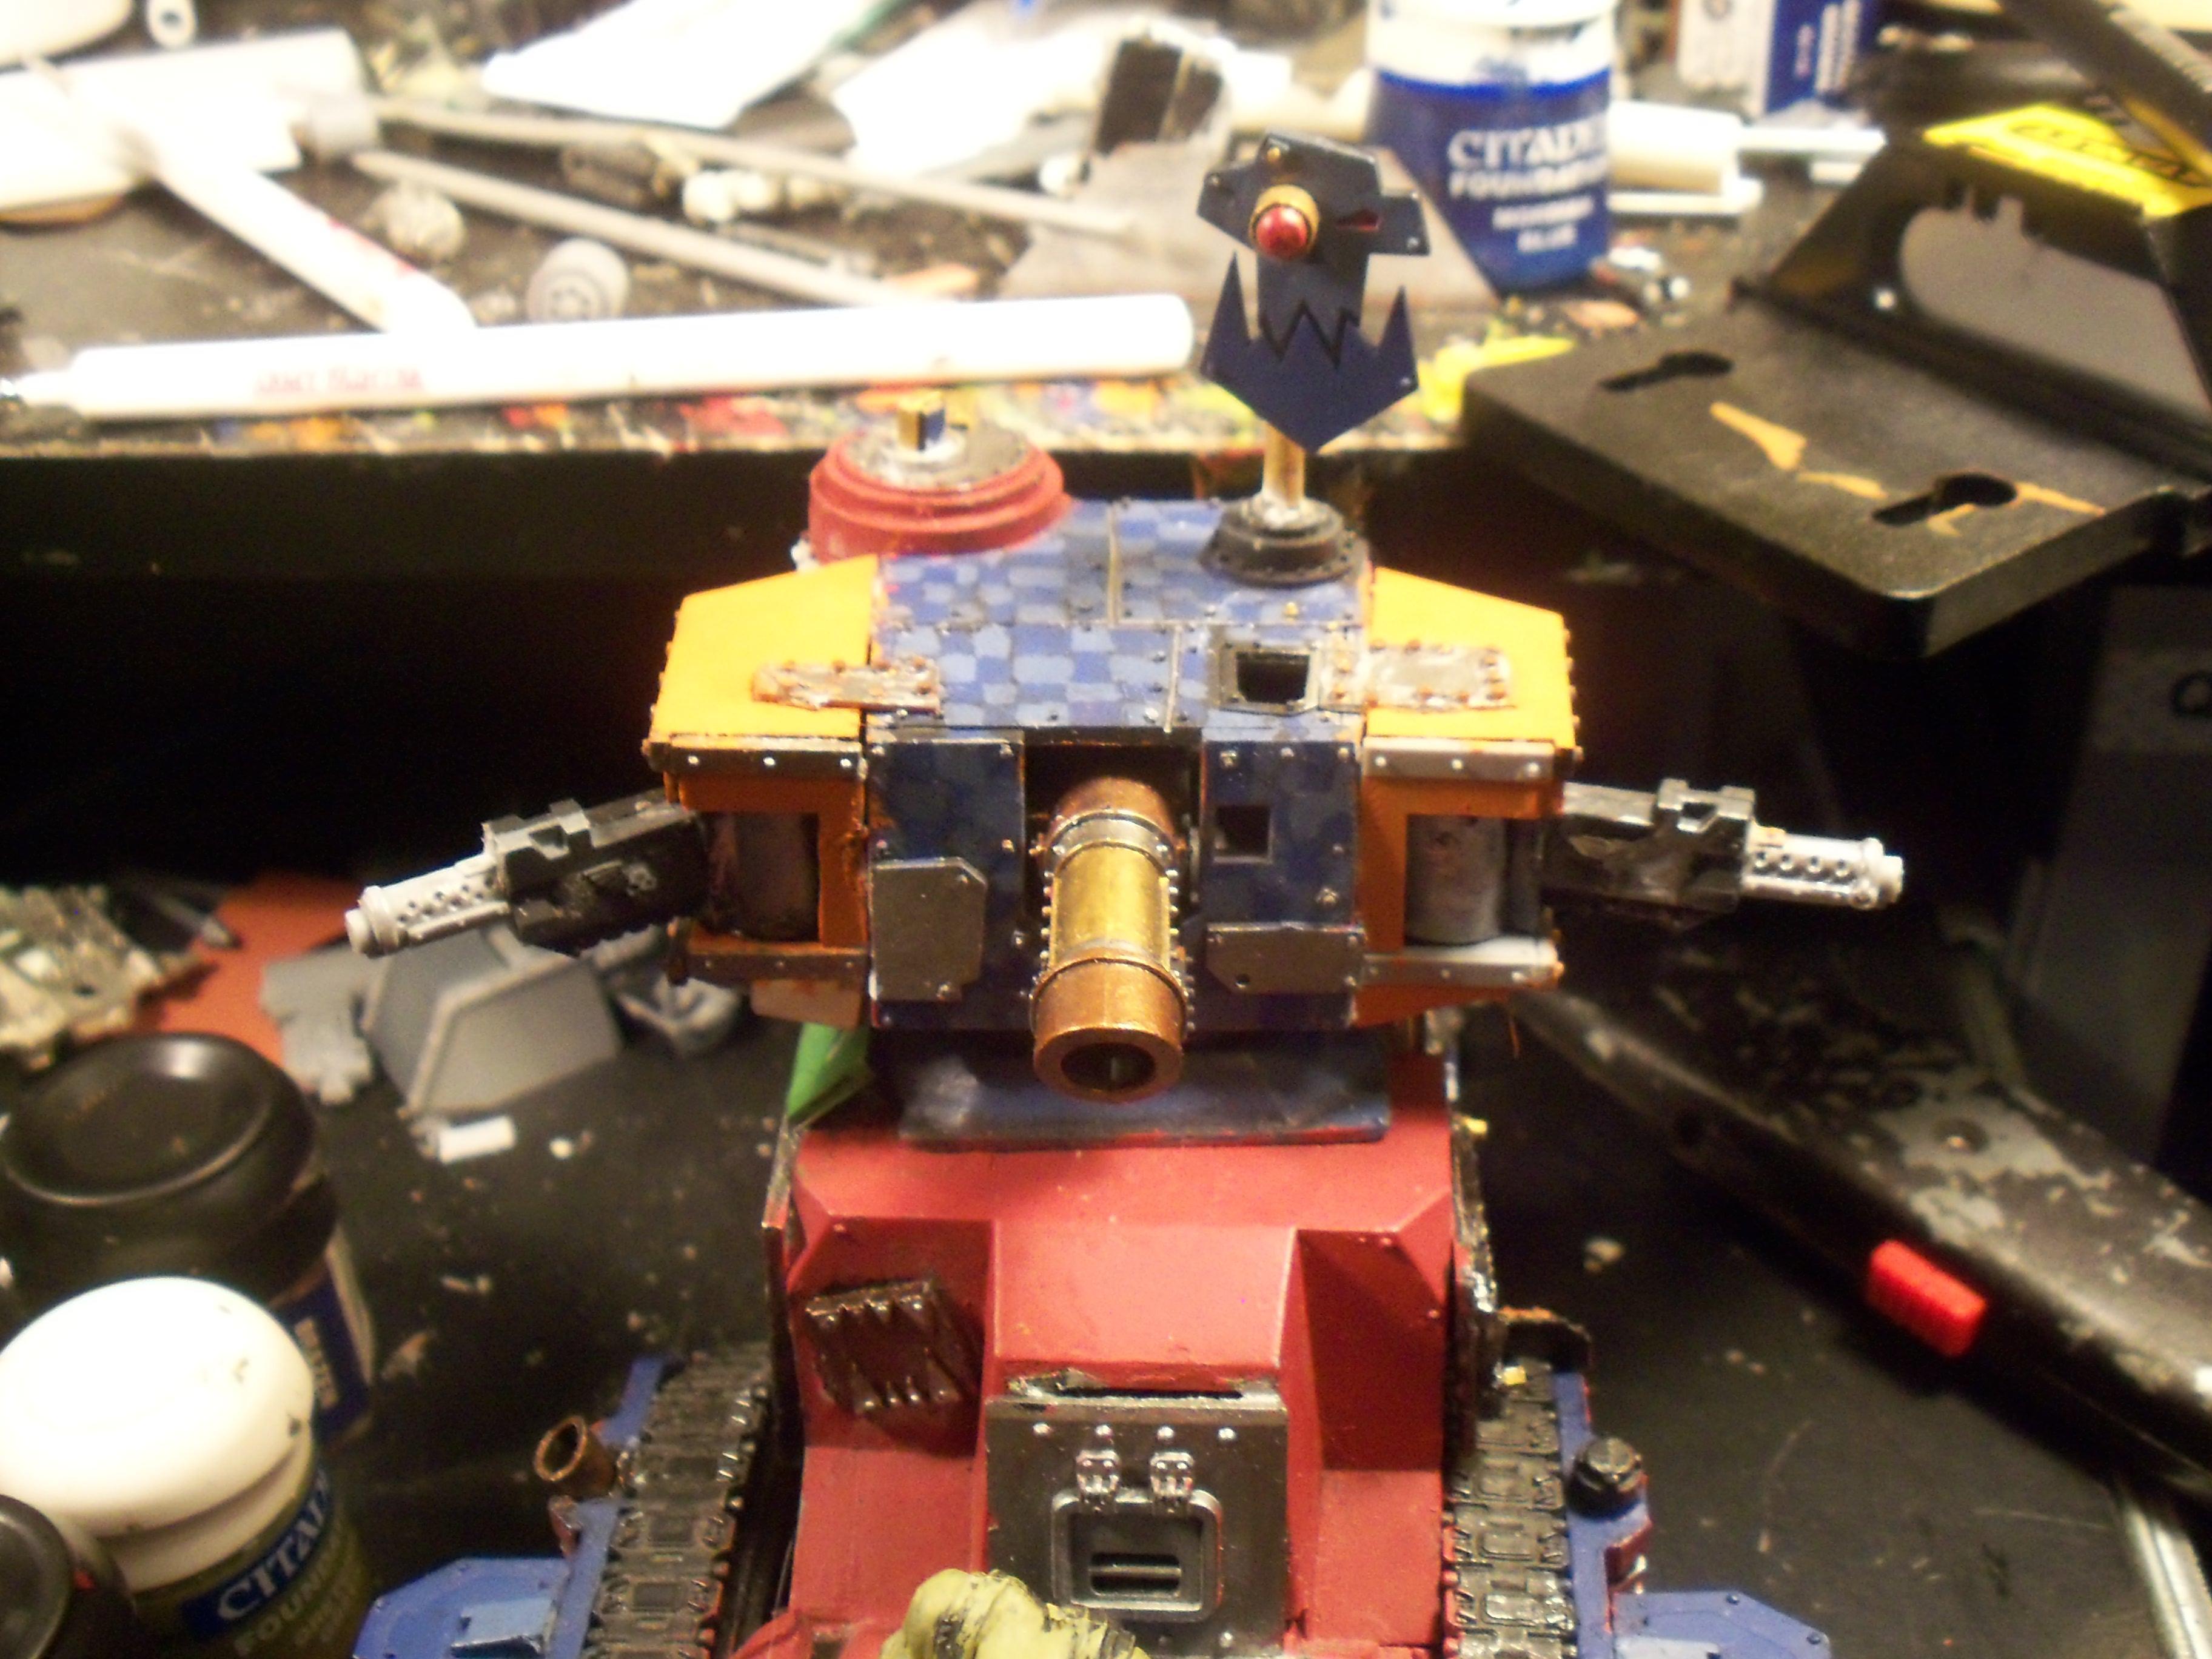 Ork turret sponsons